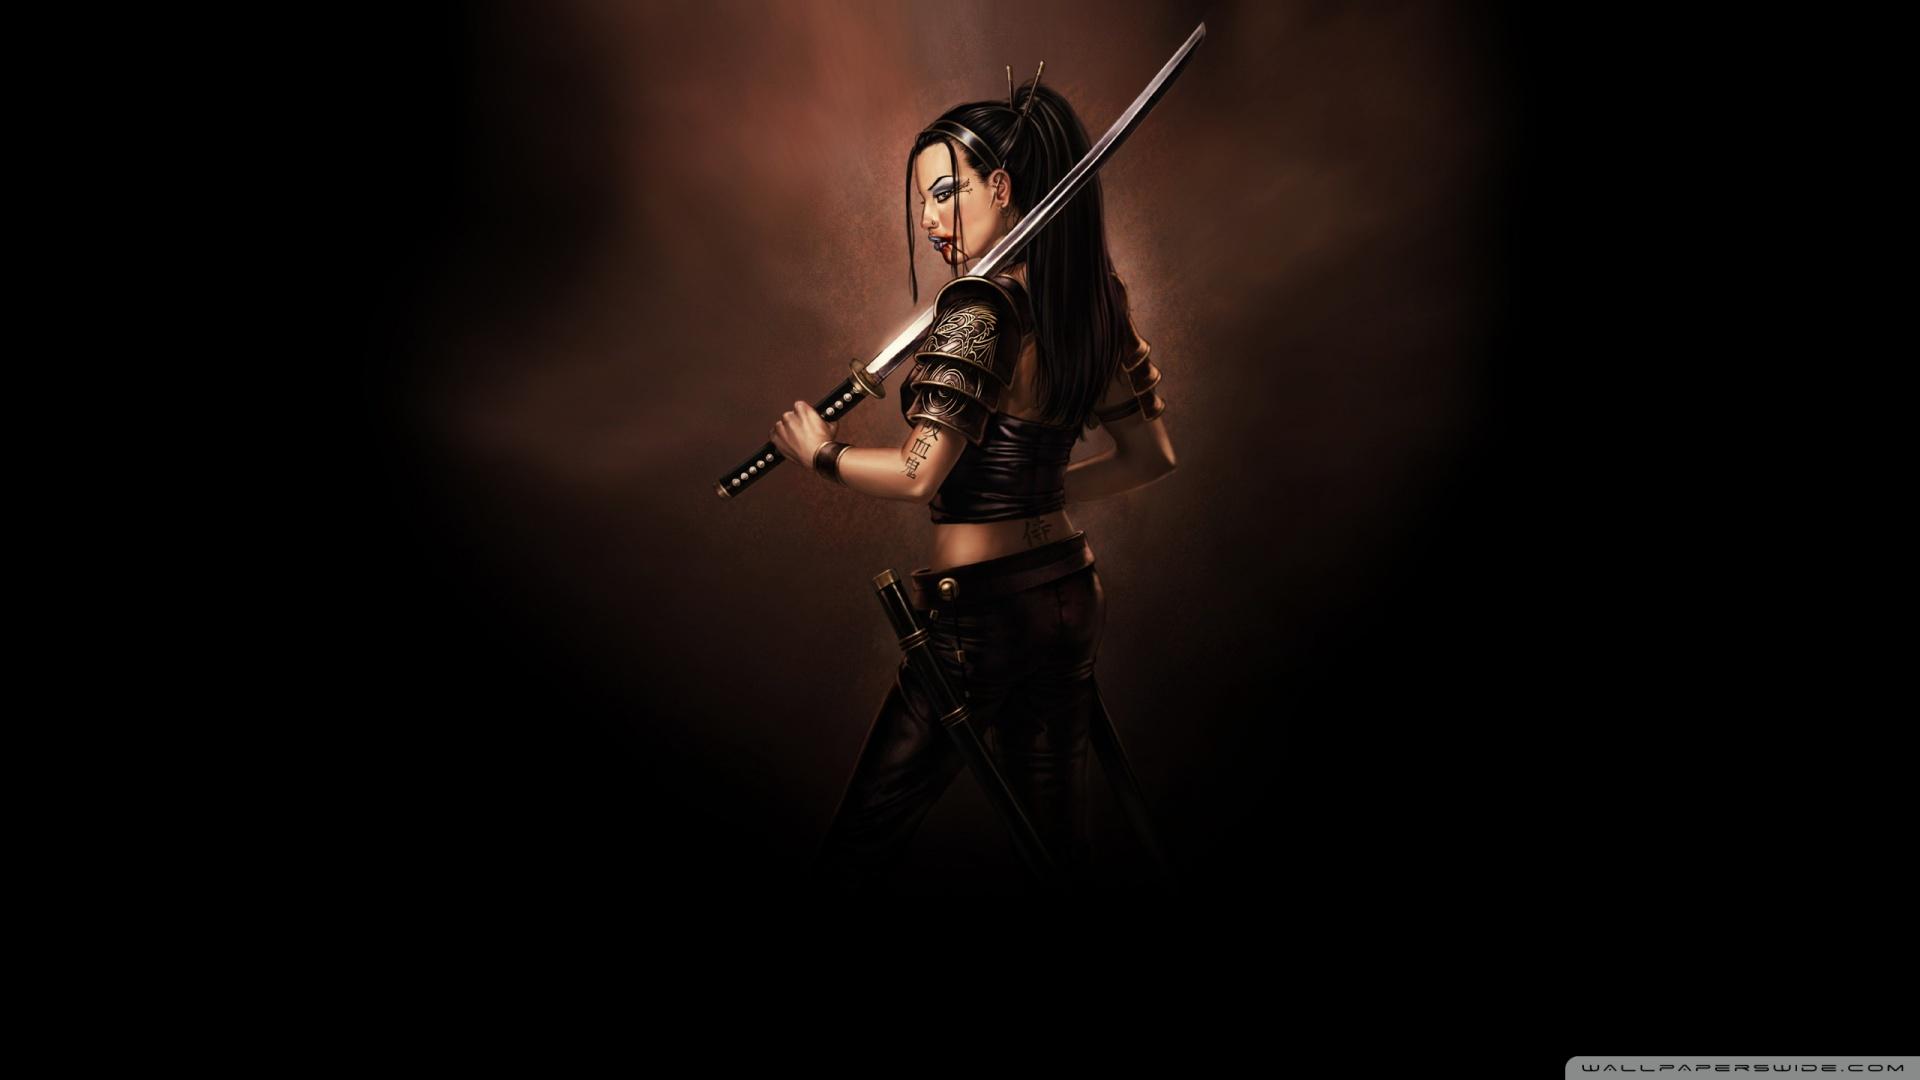 samurai sword ❤ uhd desktop wallpaper for ultra hd 4k 8k